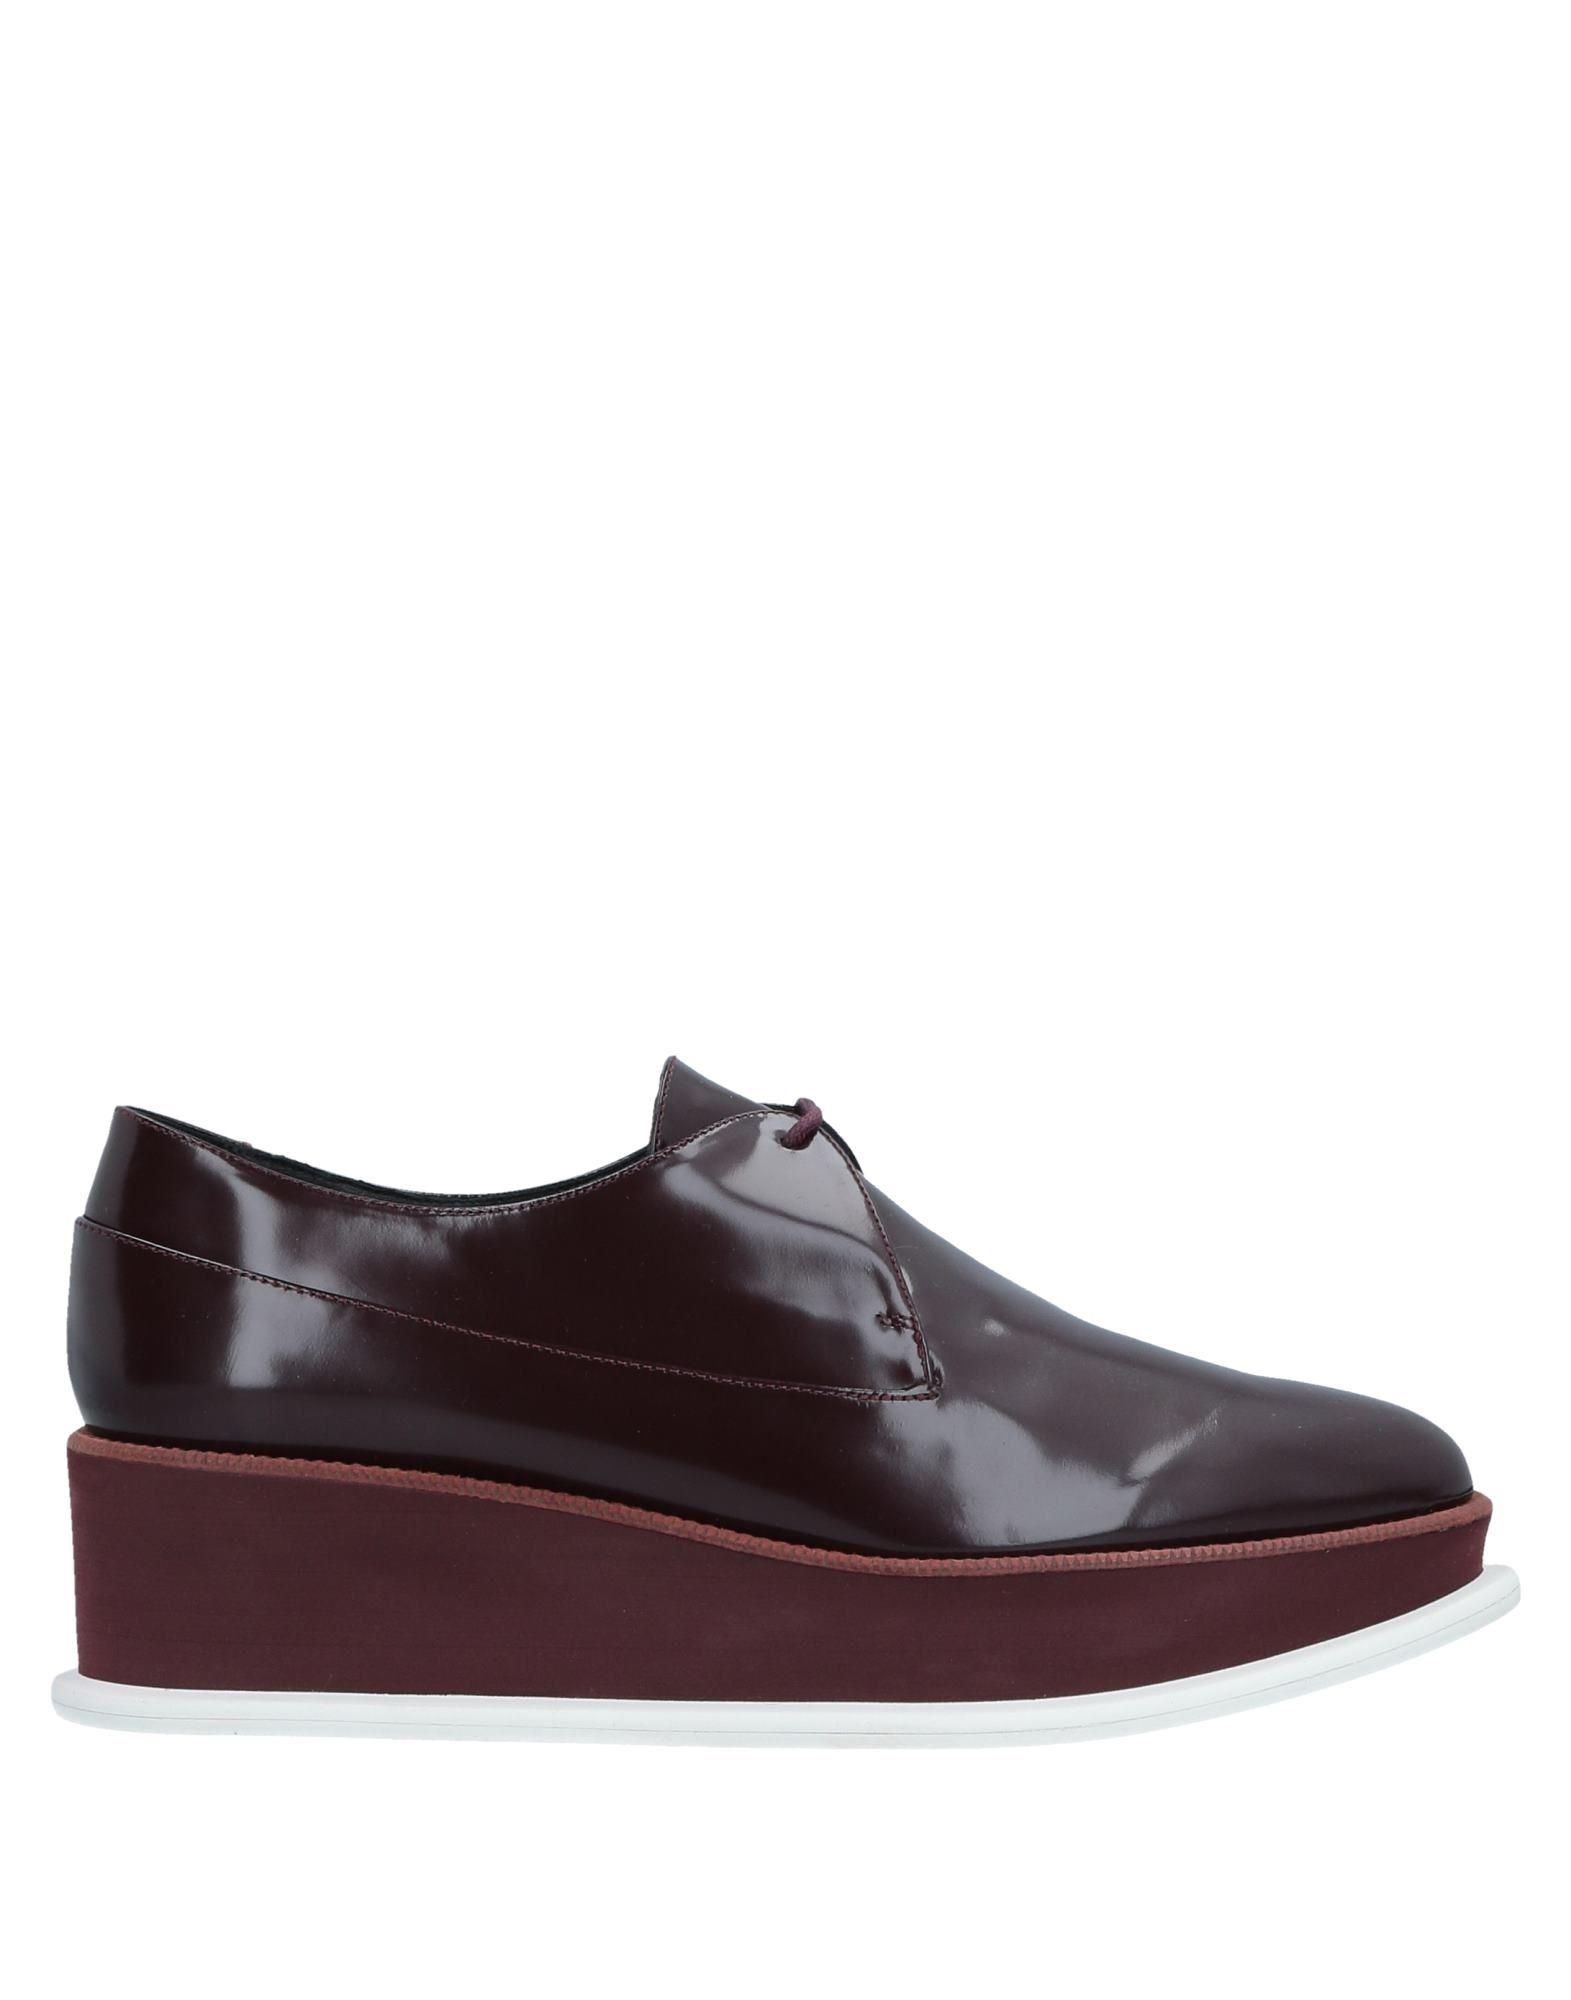 Фото - PALOMA BARCELÓ Обувь на шнурках обувь на высокой платформе dkny